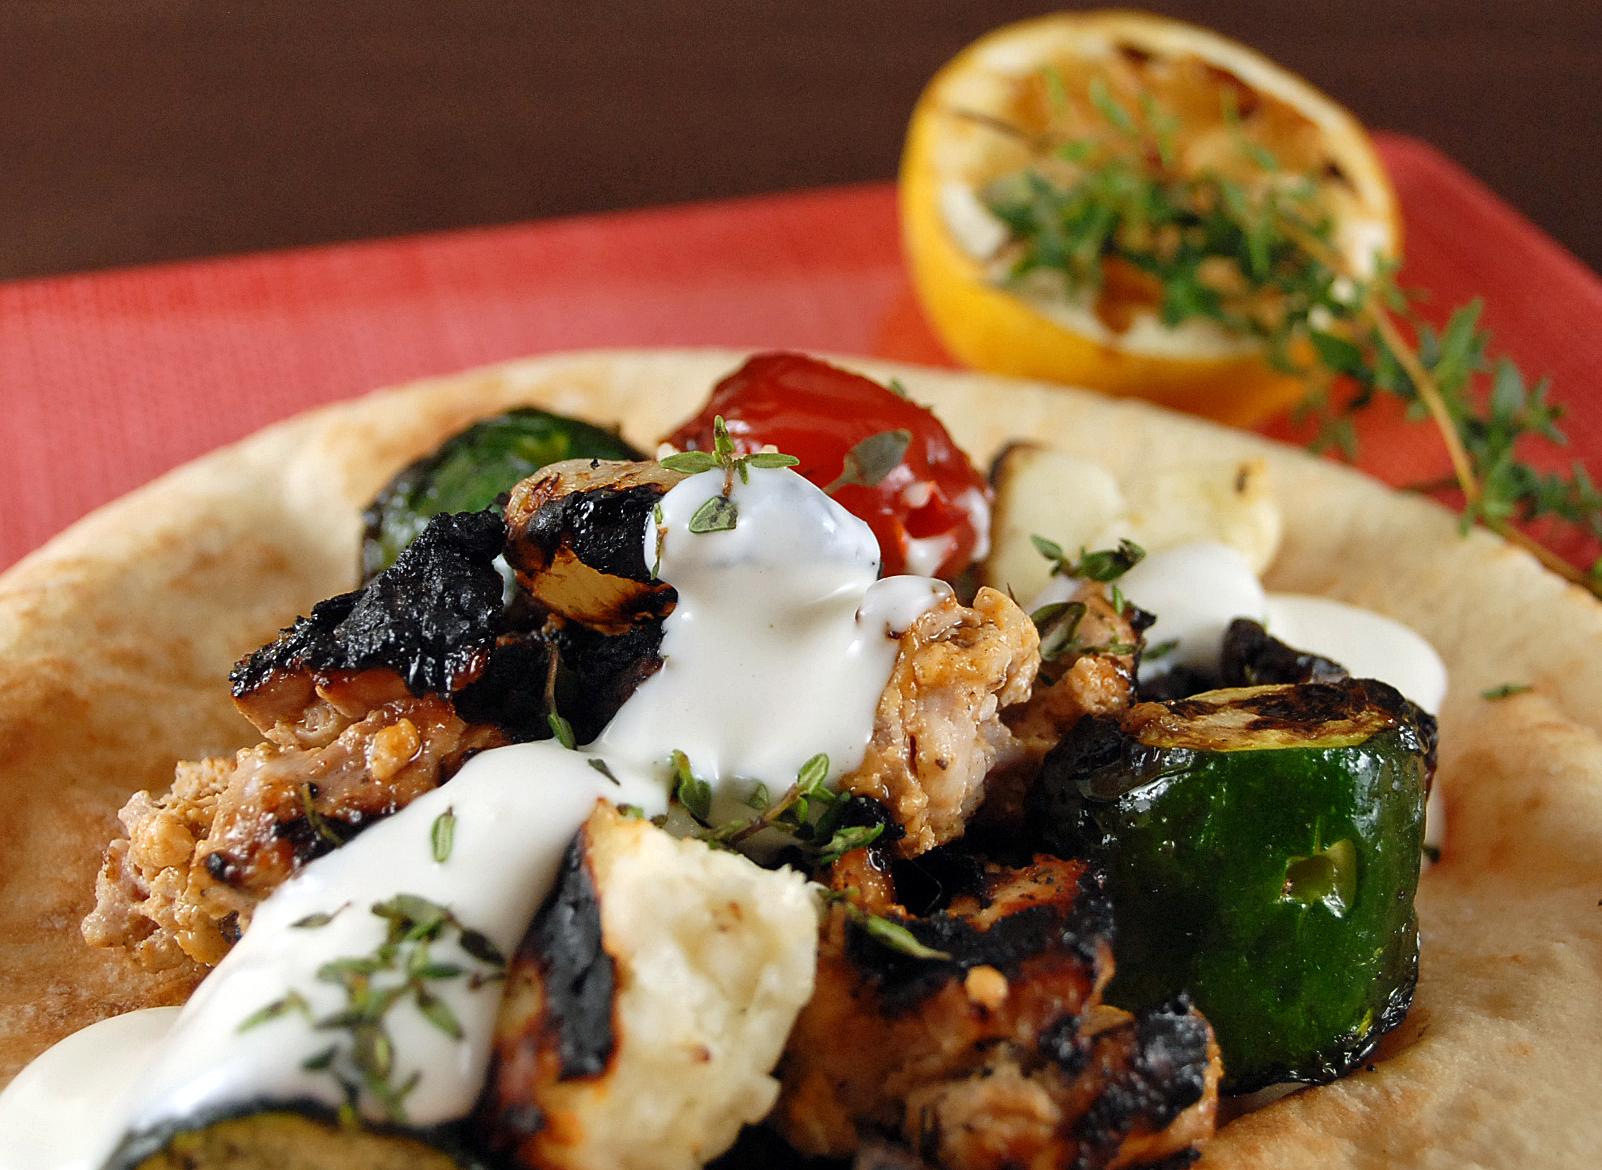 Shish Taouk with Toum (Chicken Kebabs with Garlic Sauce)